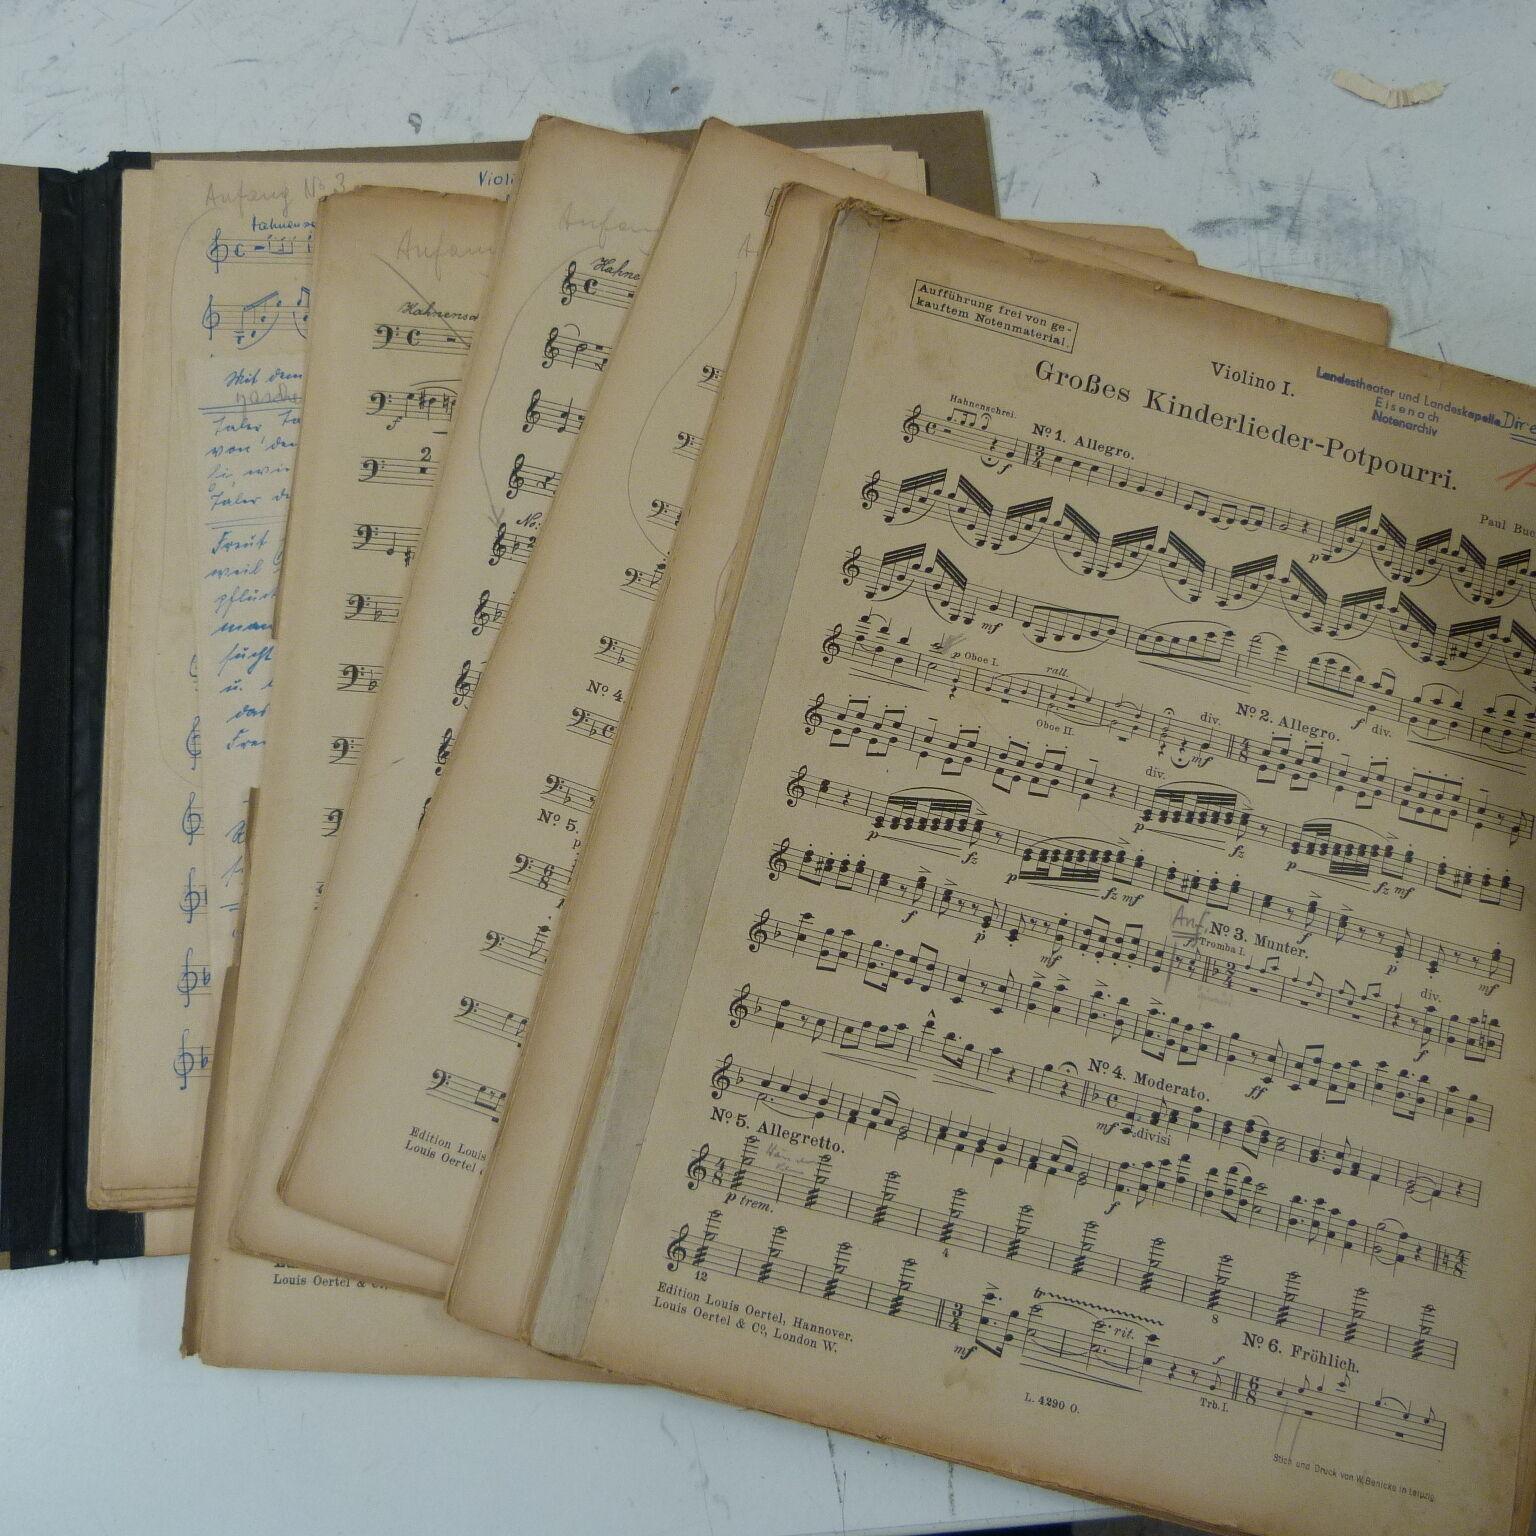 Orquesta partes grosses Kinderlieder popurrí popurrí popurrí Buchwald  Felices compras